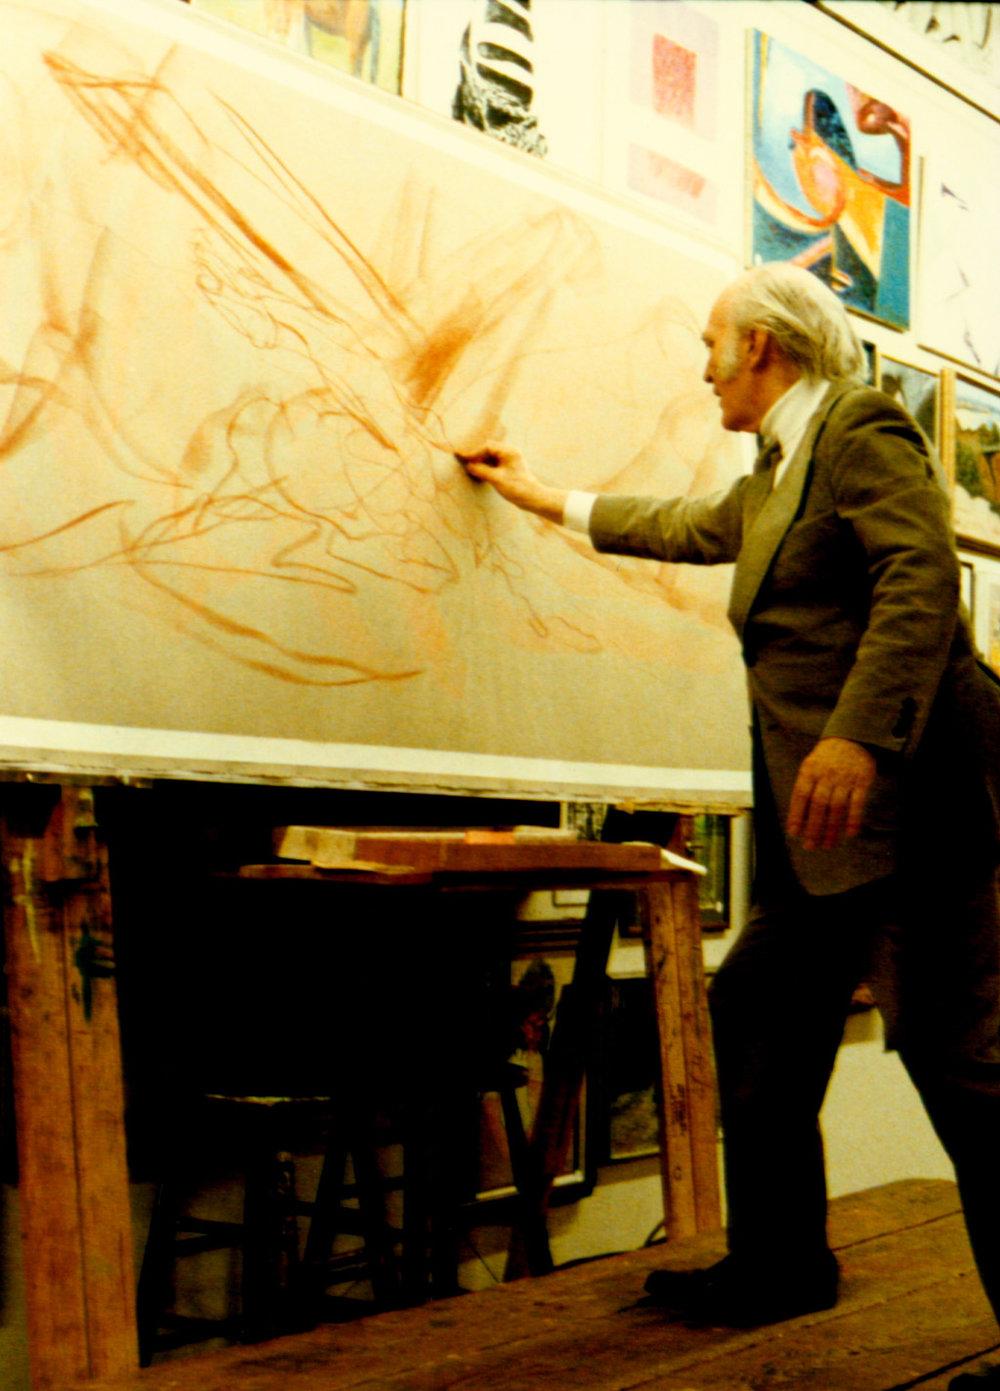 1986 - Apocalypse (lecture chalks, 4 x 8, paper)